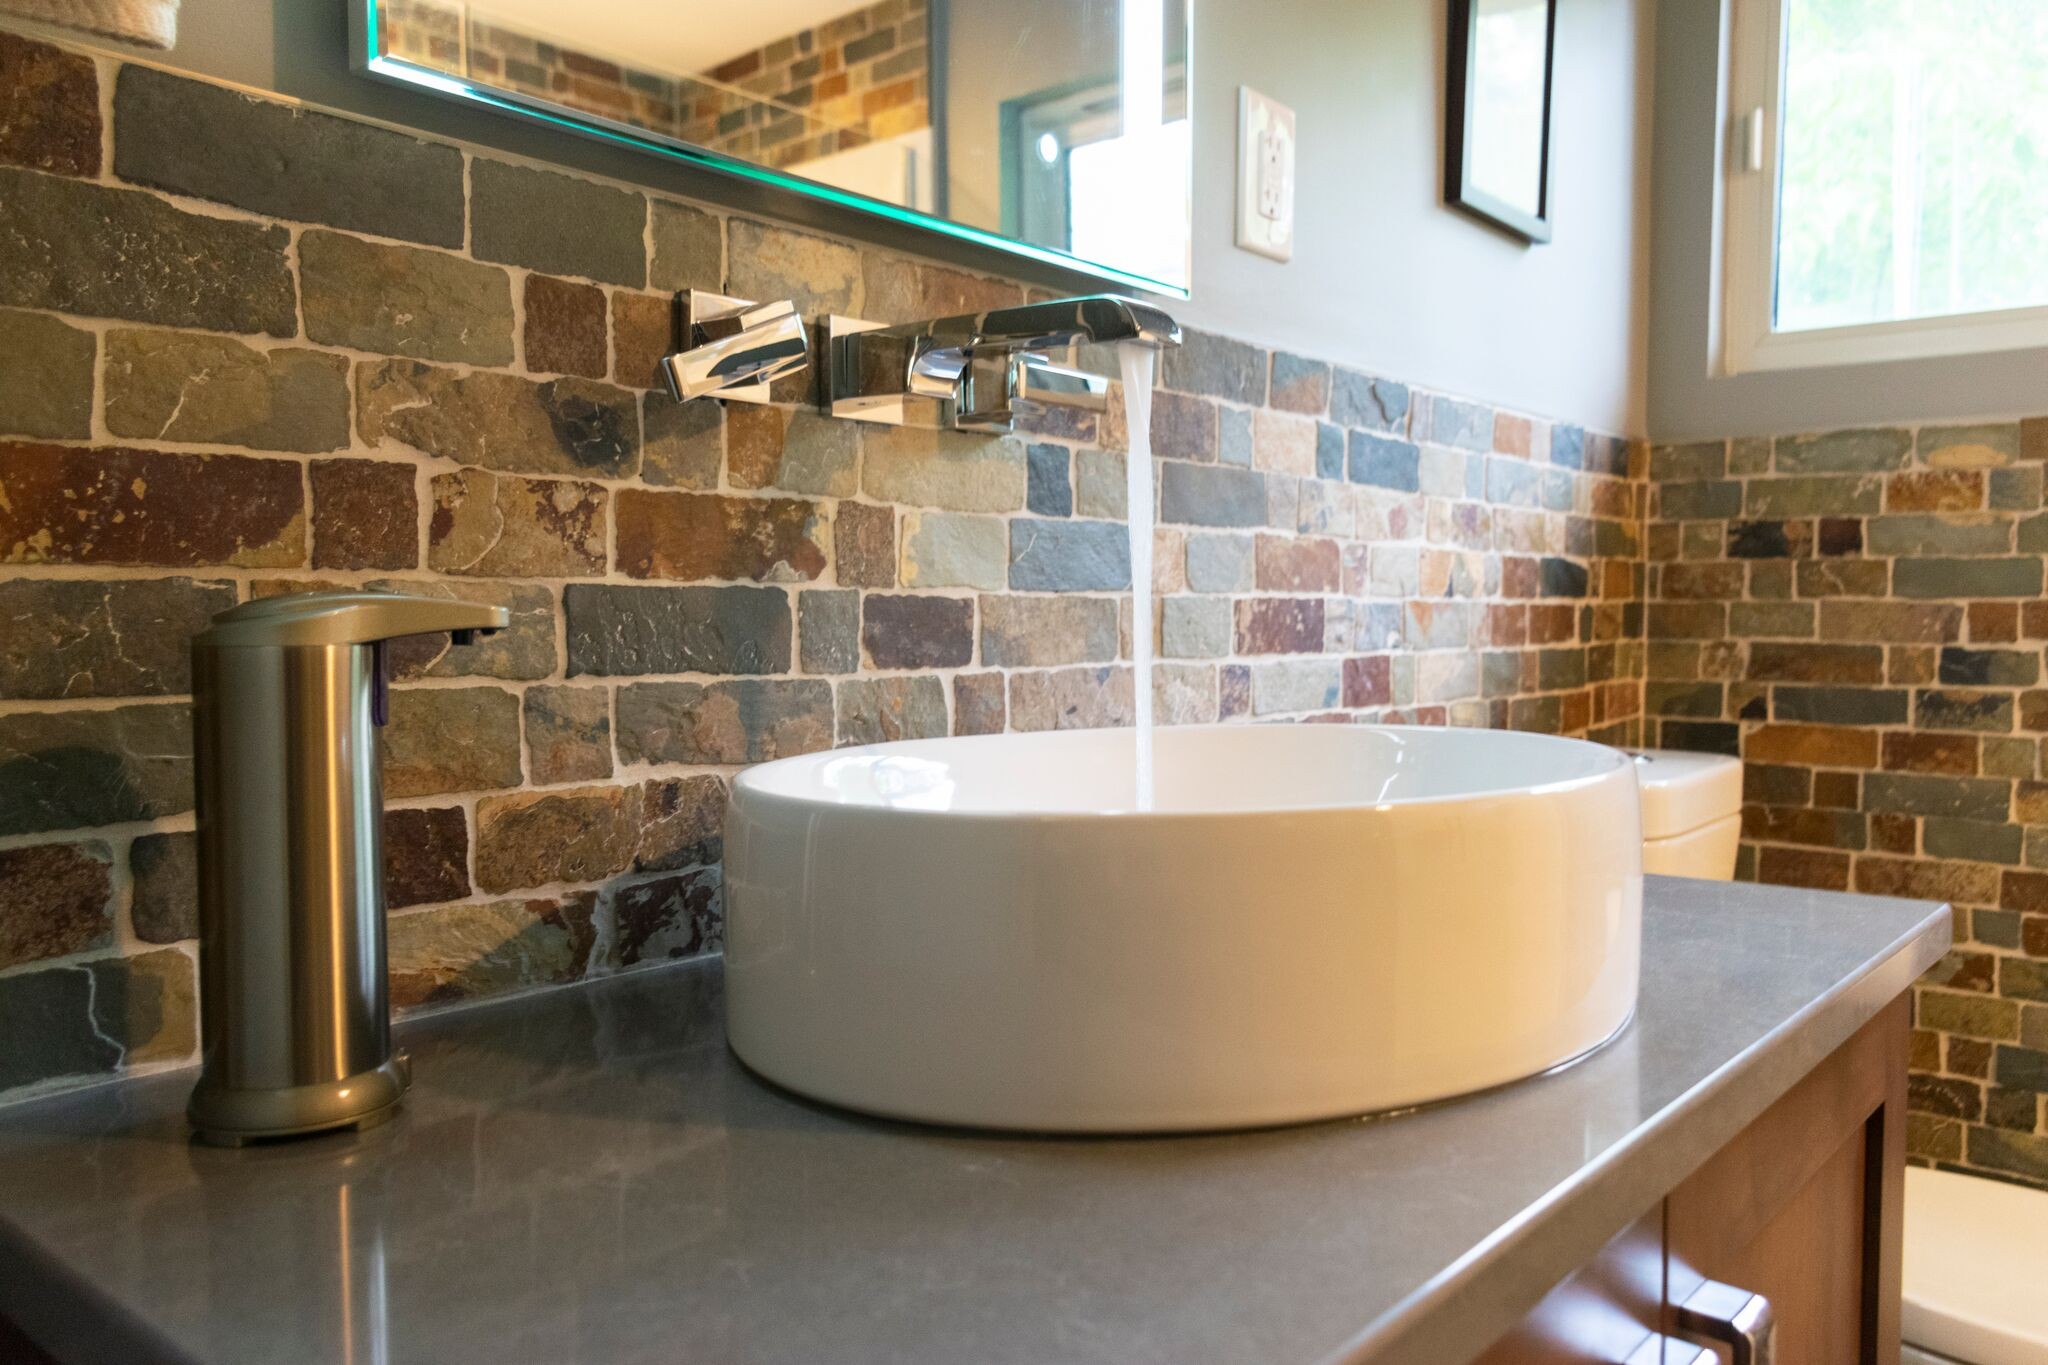 Bathroom Remodel with brick backsplash